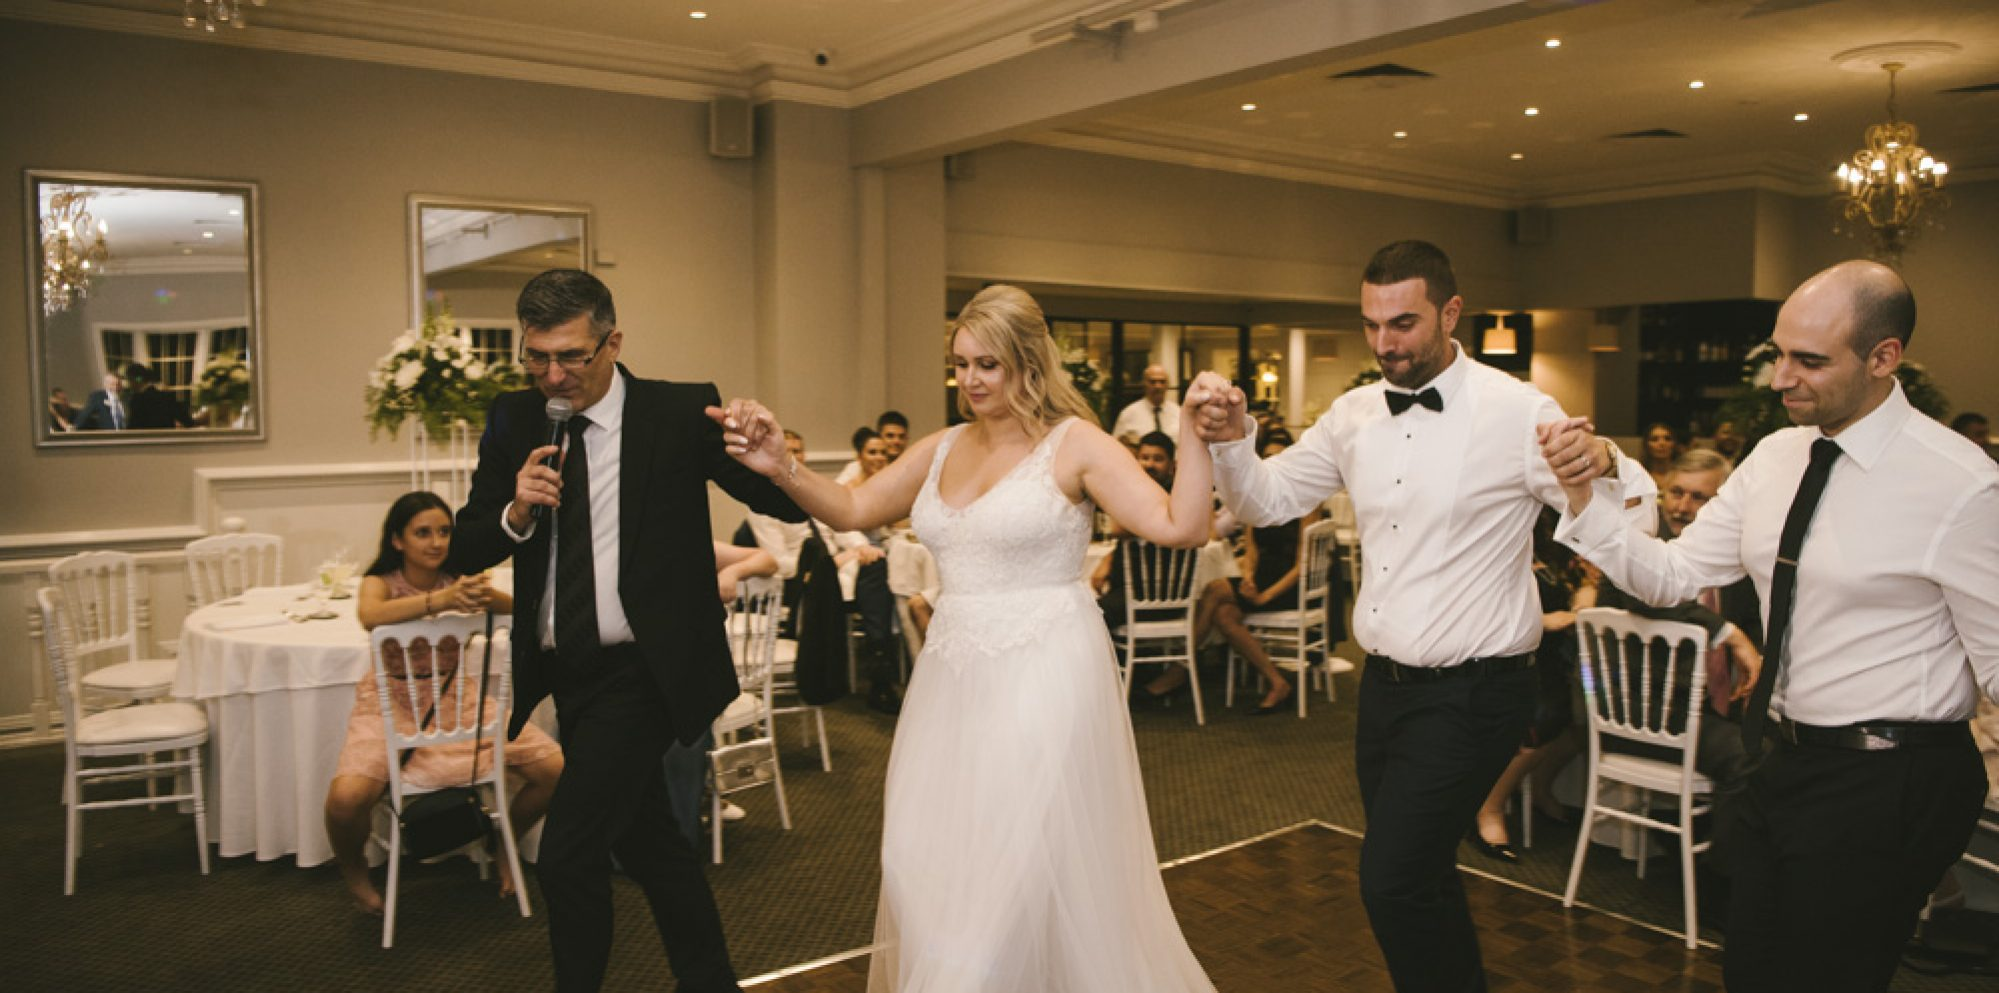 11 big fat greek wedding traditions followed by australian greeks